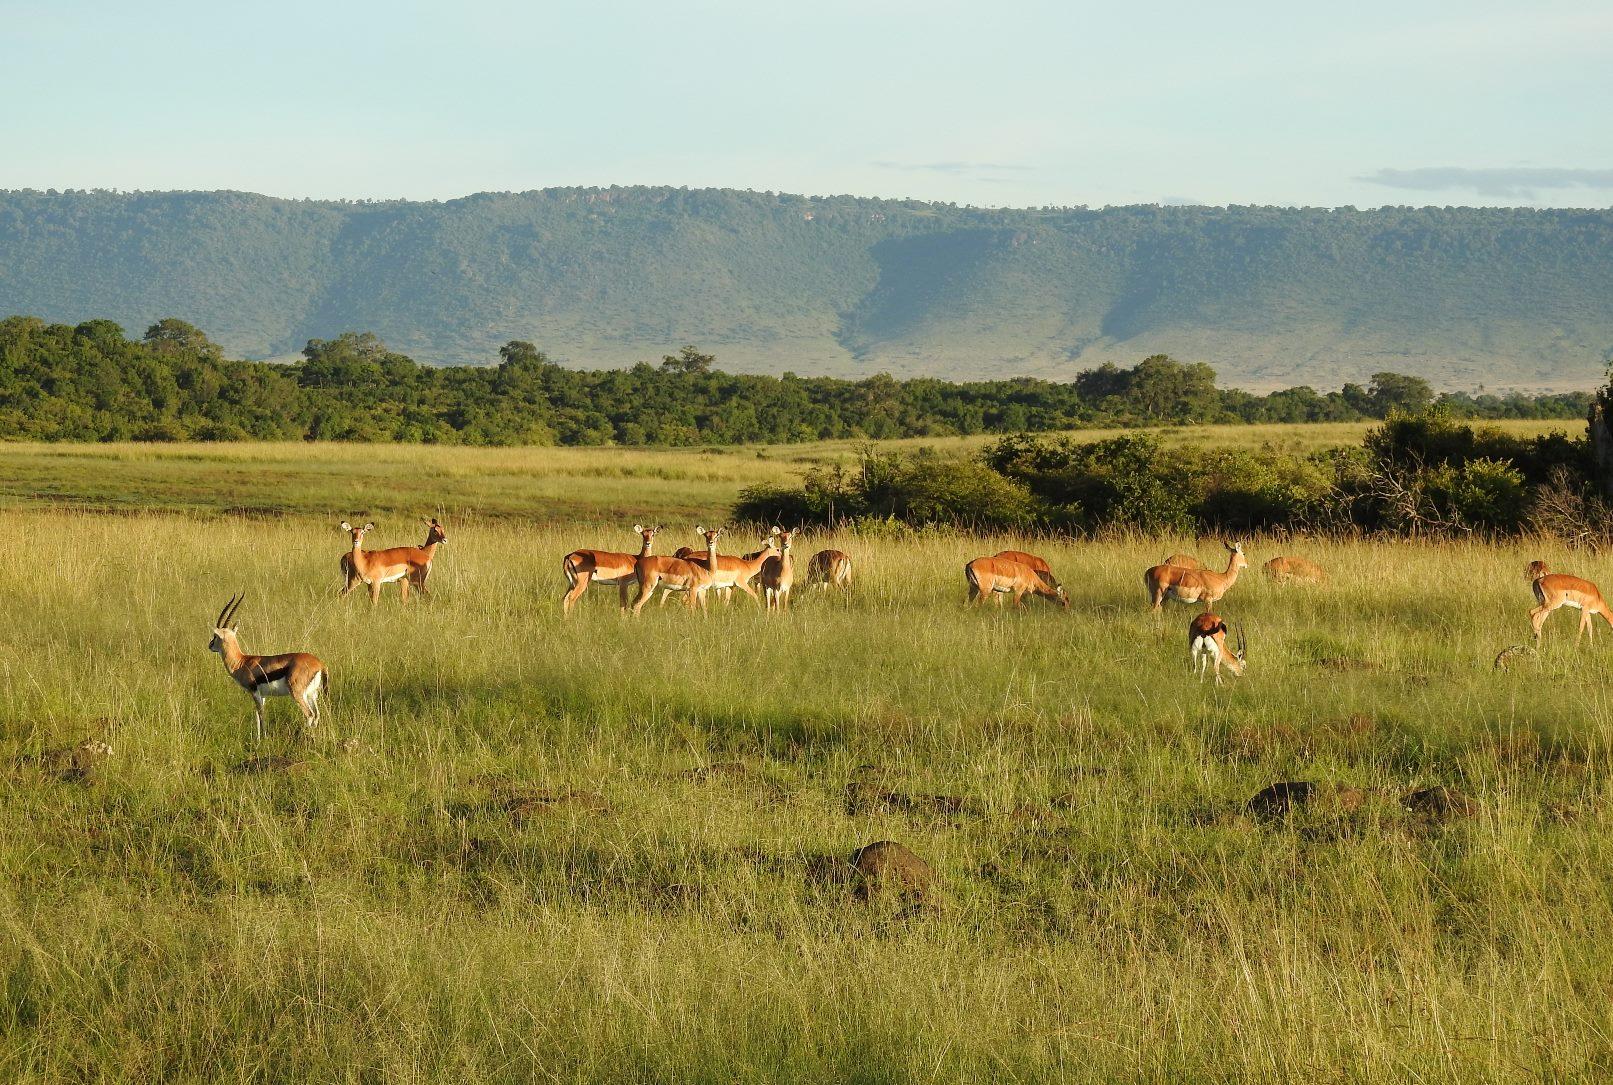 Impala graze in the Mara Triangle with the escarpment leading to Tanzania's Serengeti National Park in the background.